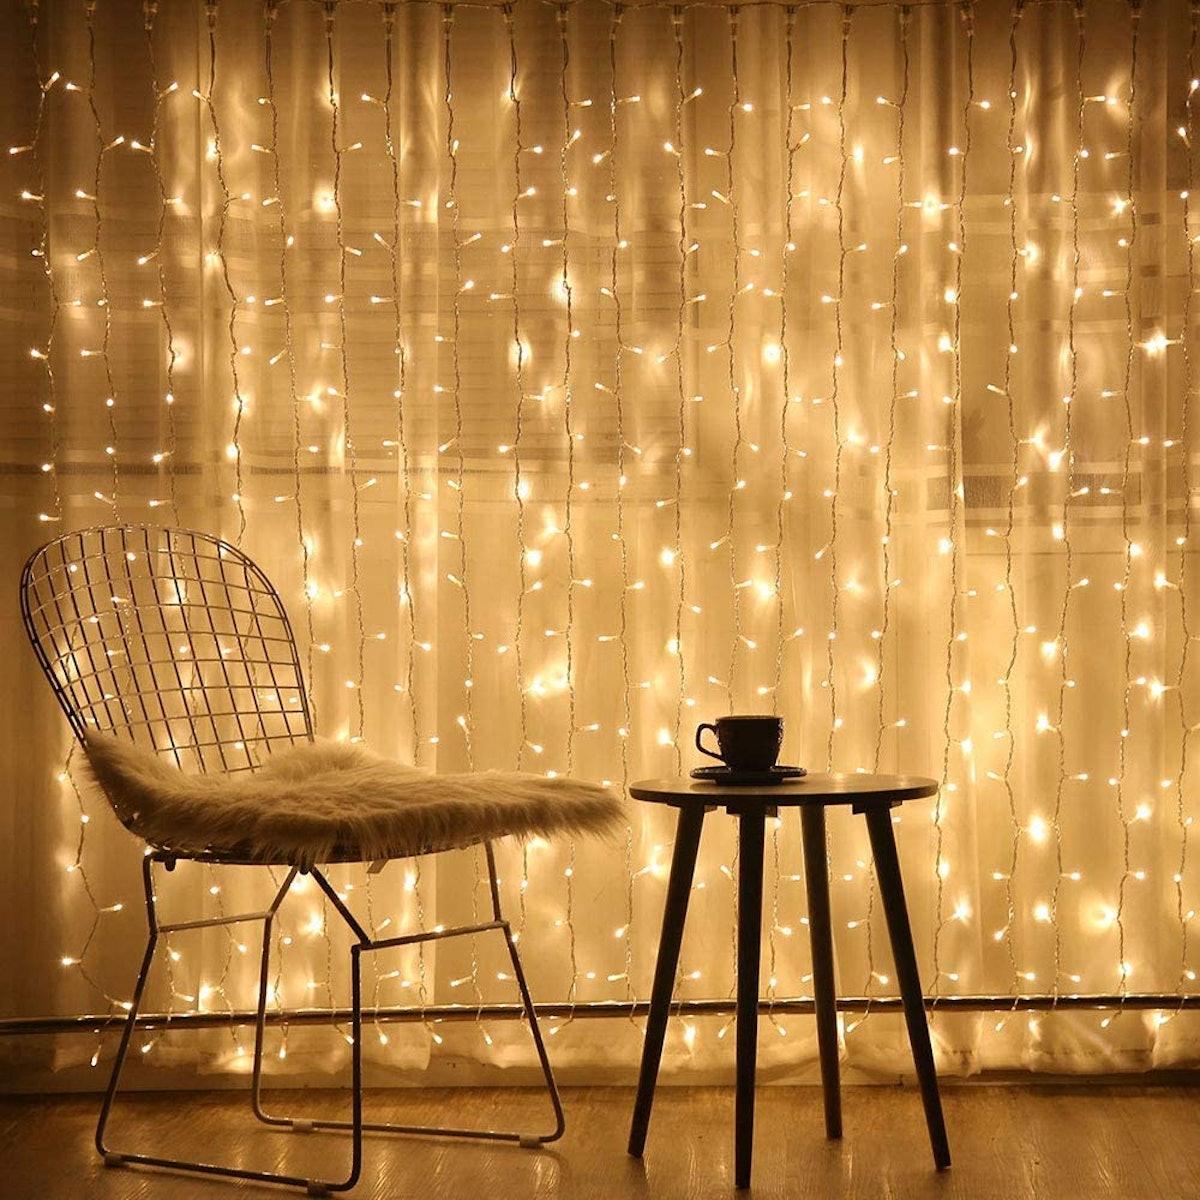 Brightown Hanging Window Curtain Lights (10 Feet)